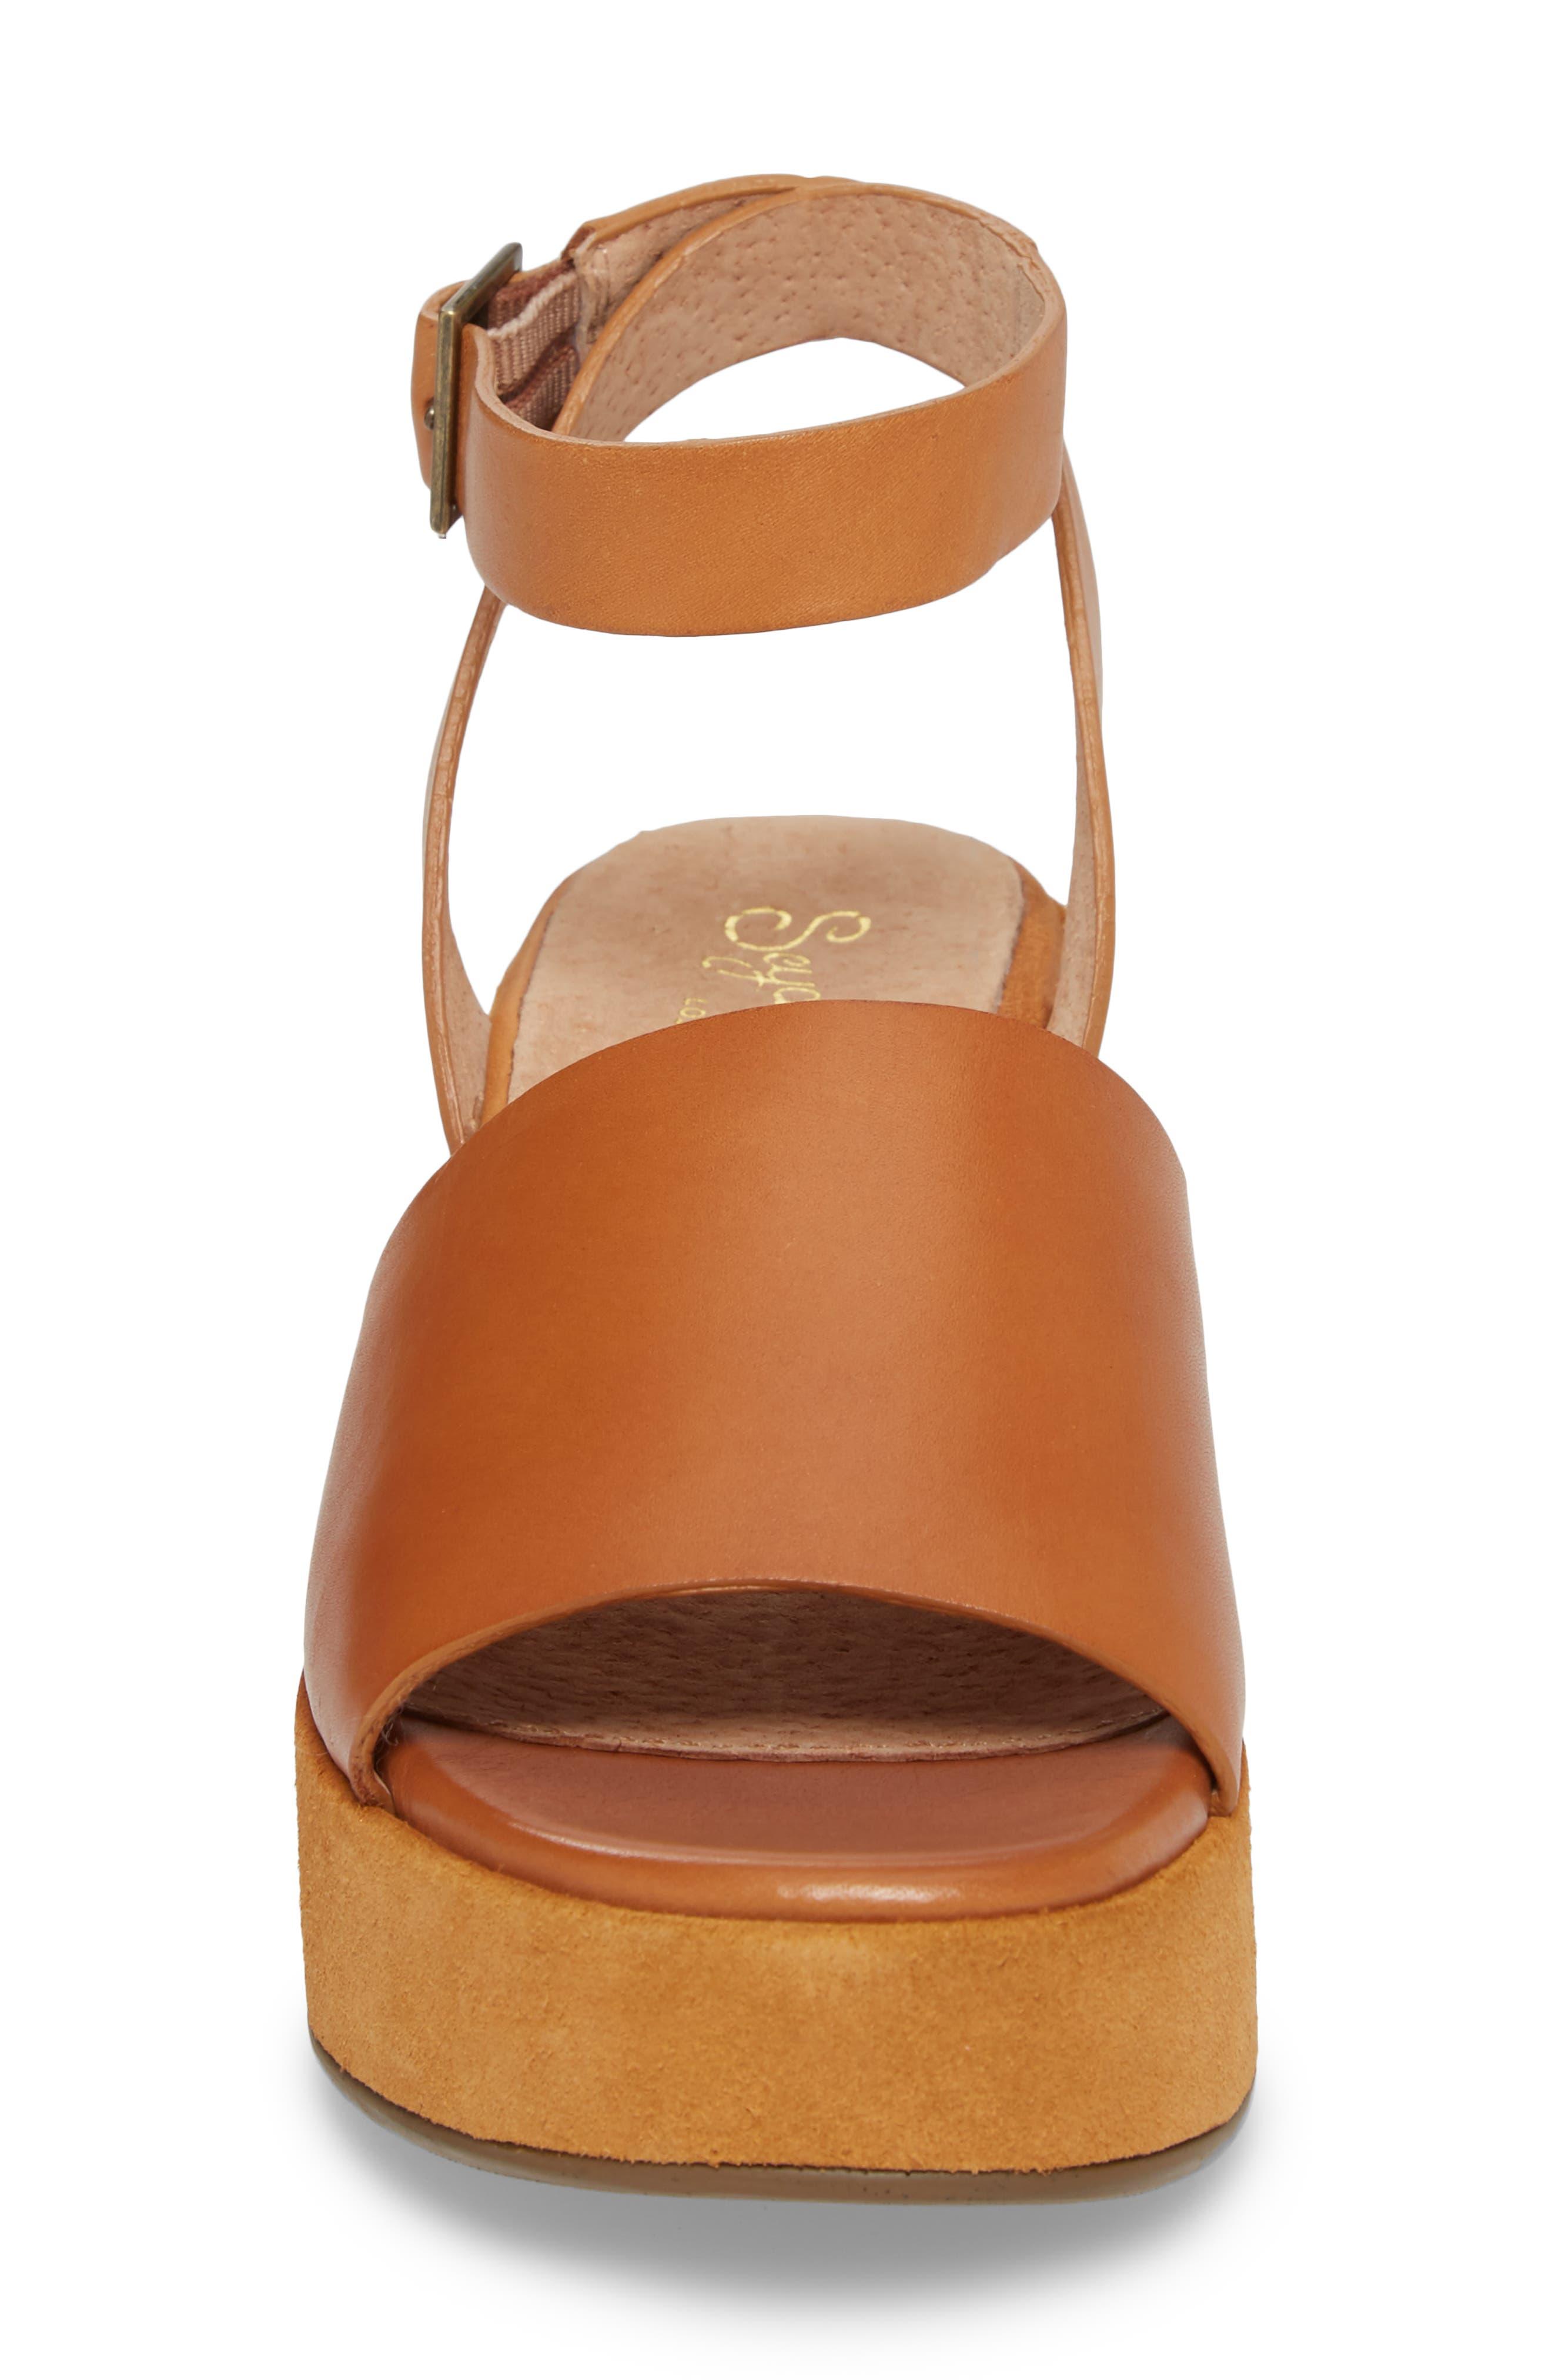 Calming Influence Platform Sandal,                             Alternate thumbnail 4, color,                             Tan Leather